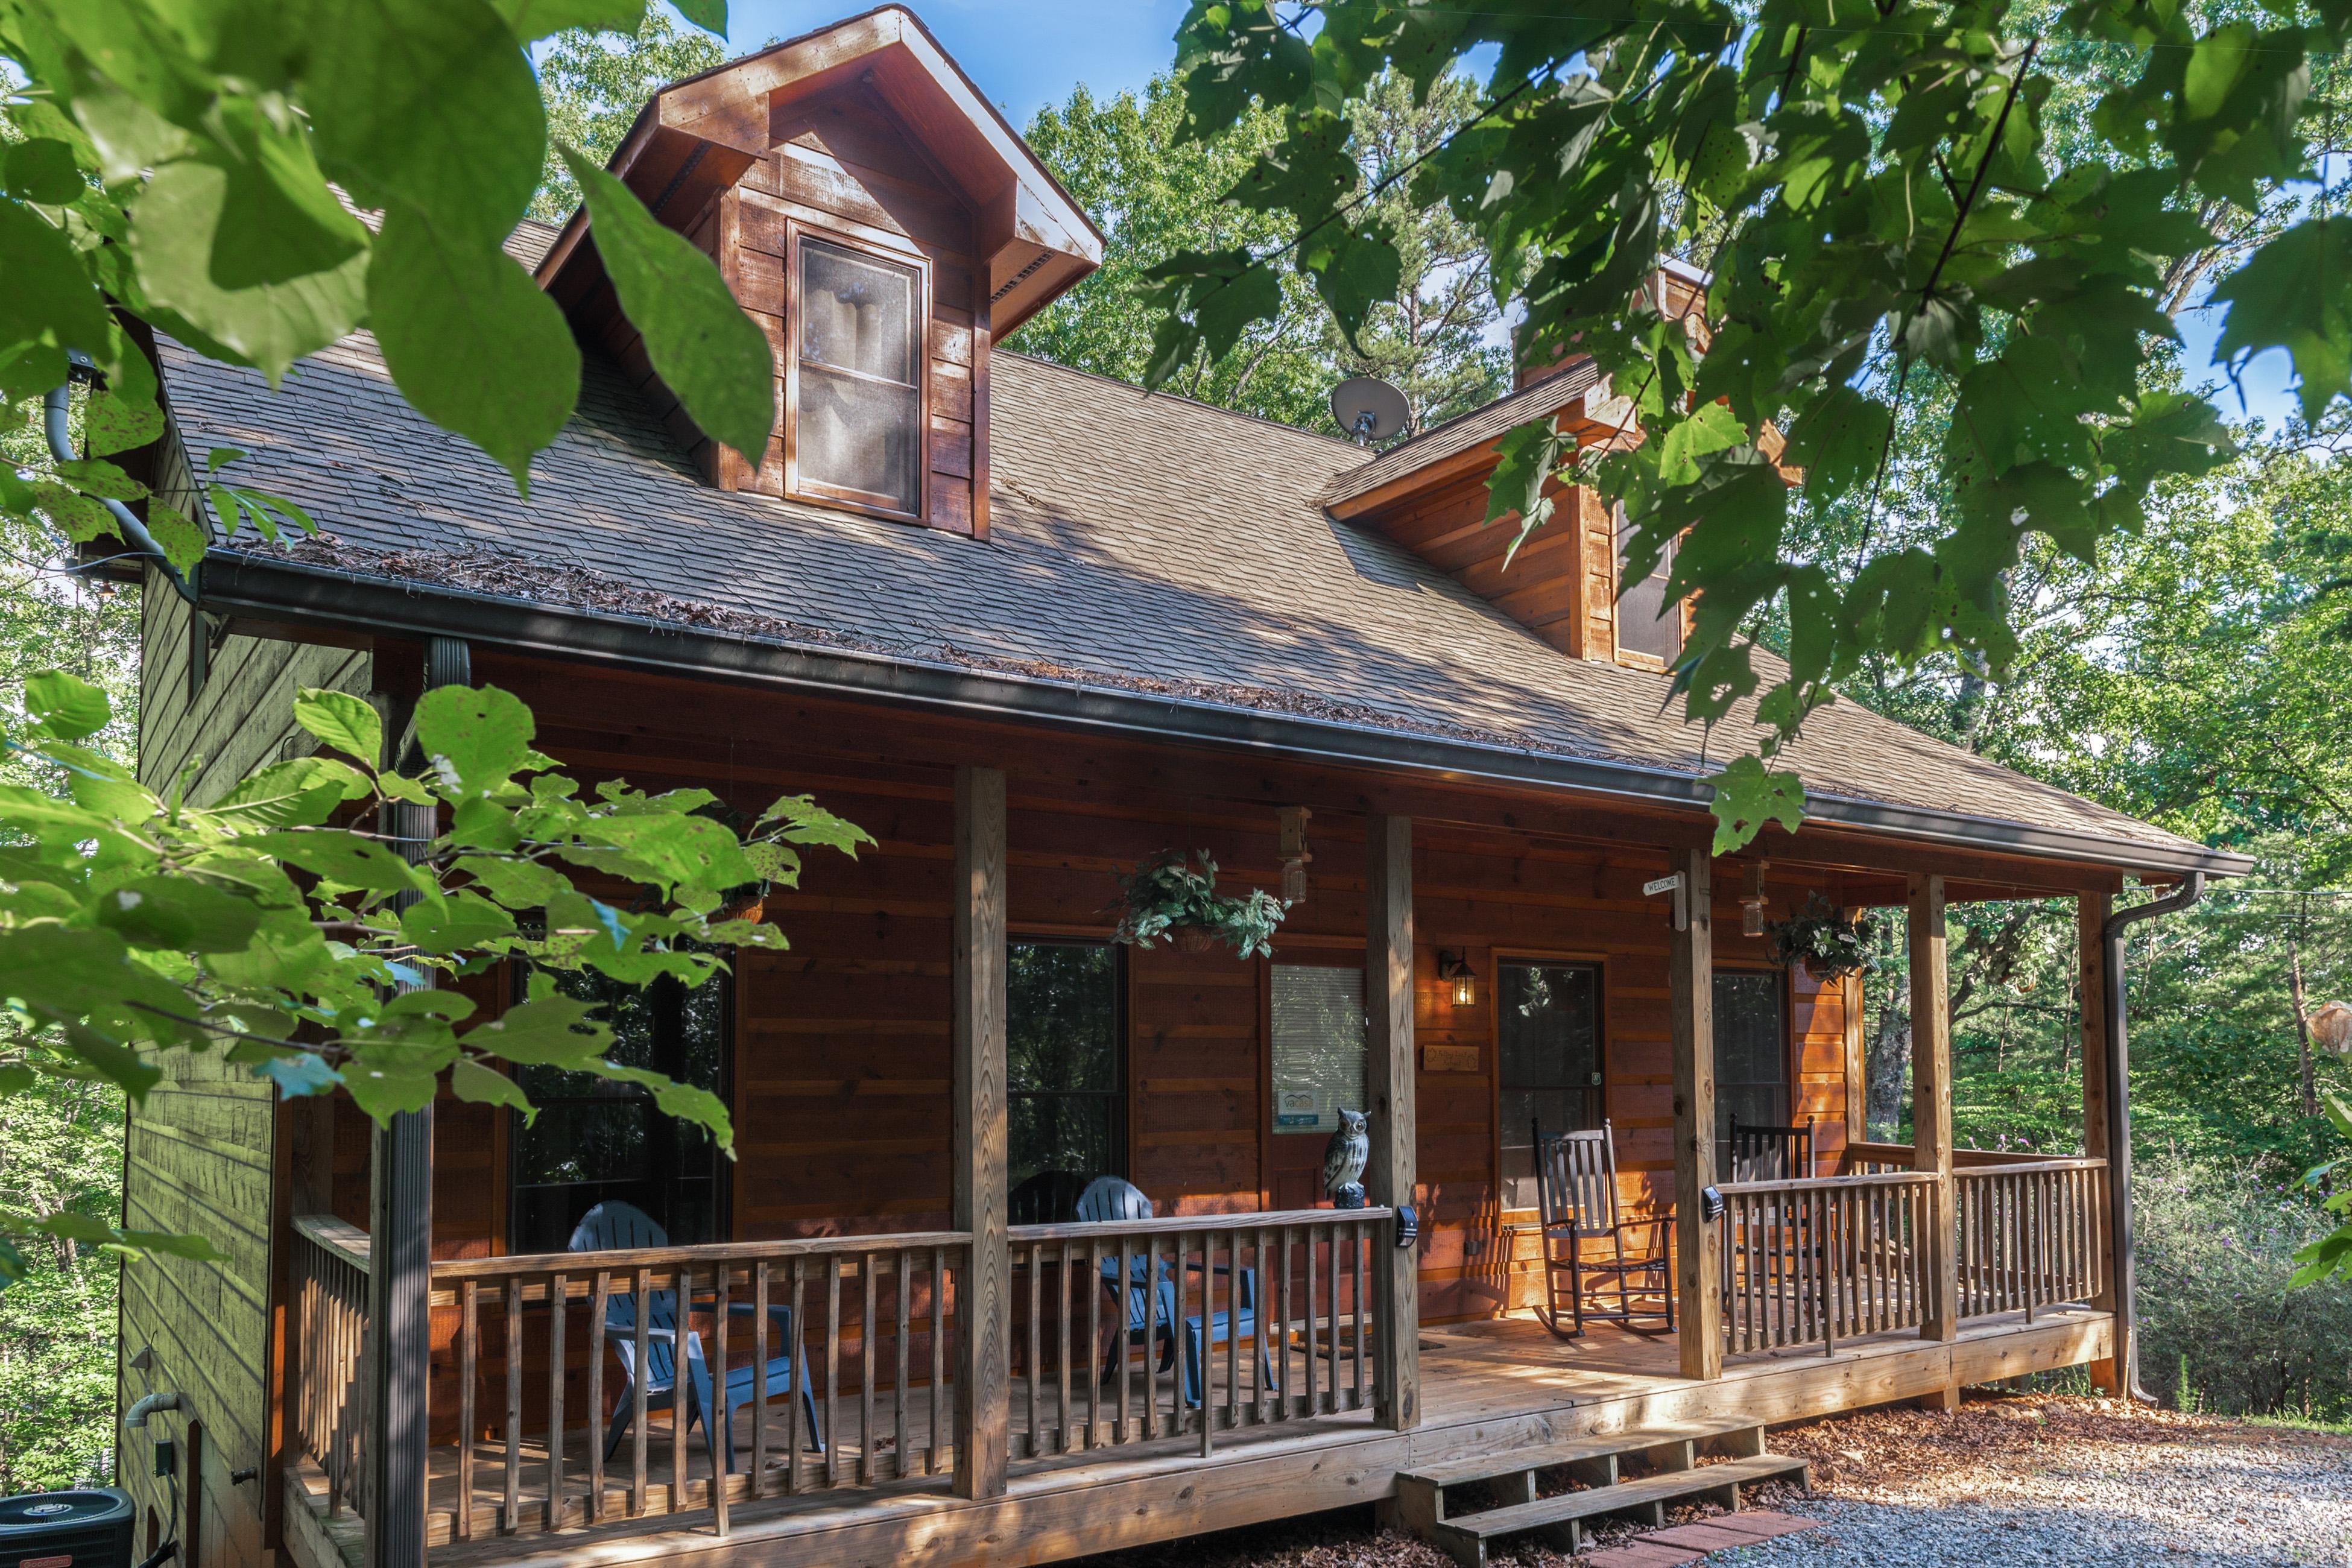 ellijay cabins houses mountain ridge in rentals romantic for rent virginia blue west nc cabin ga